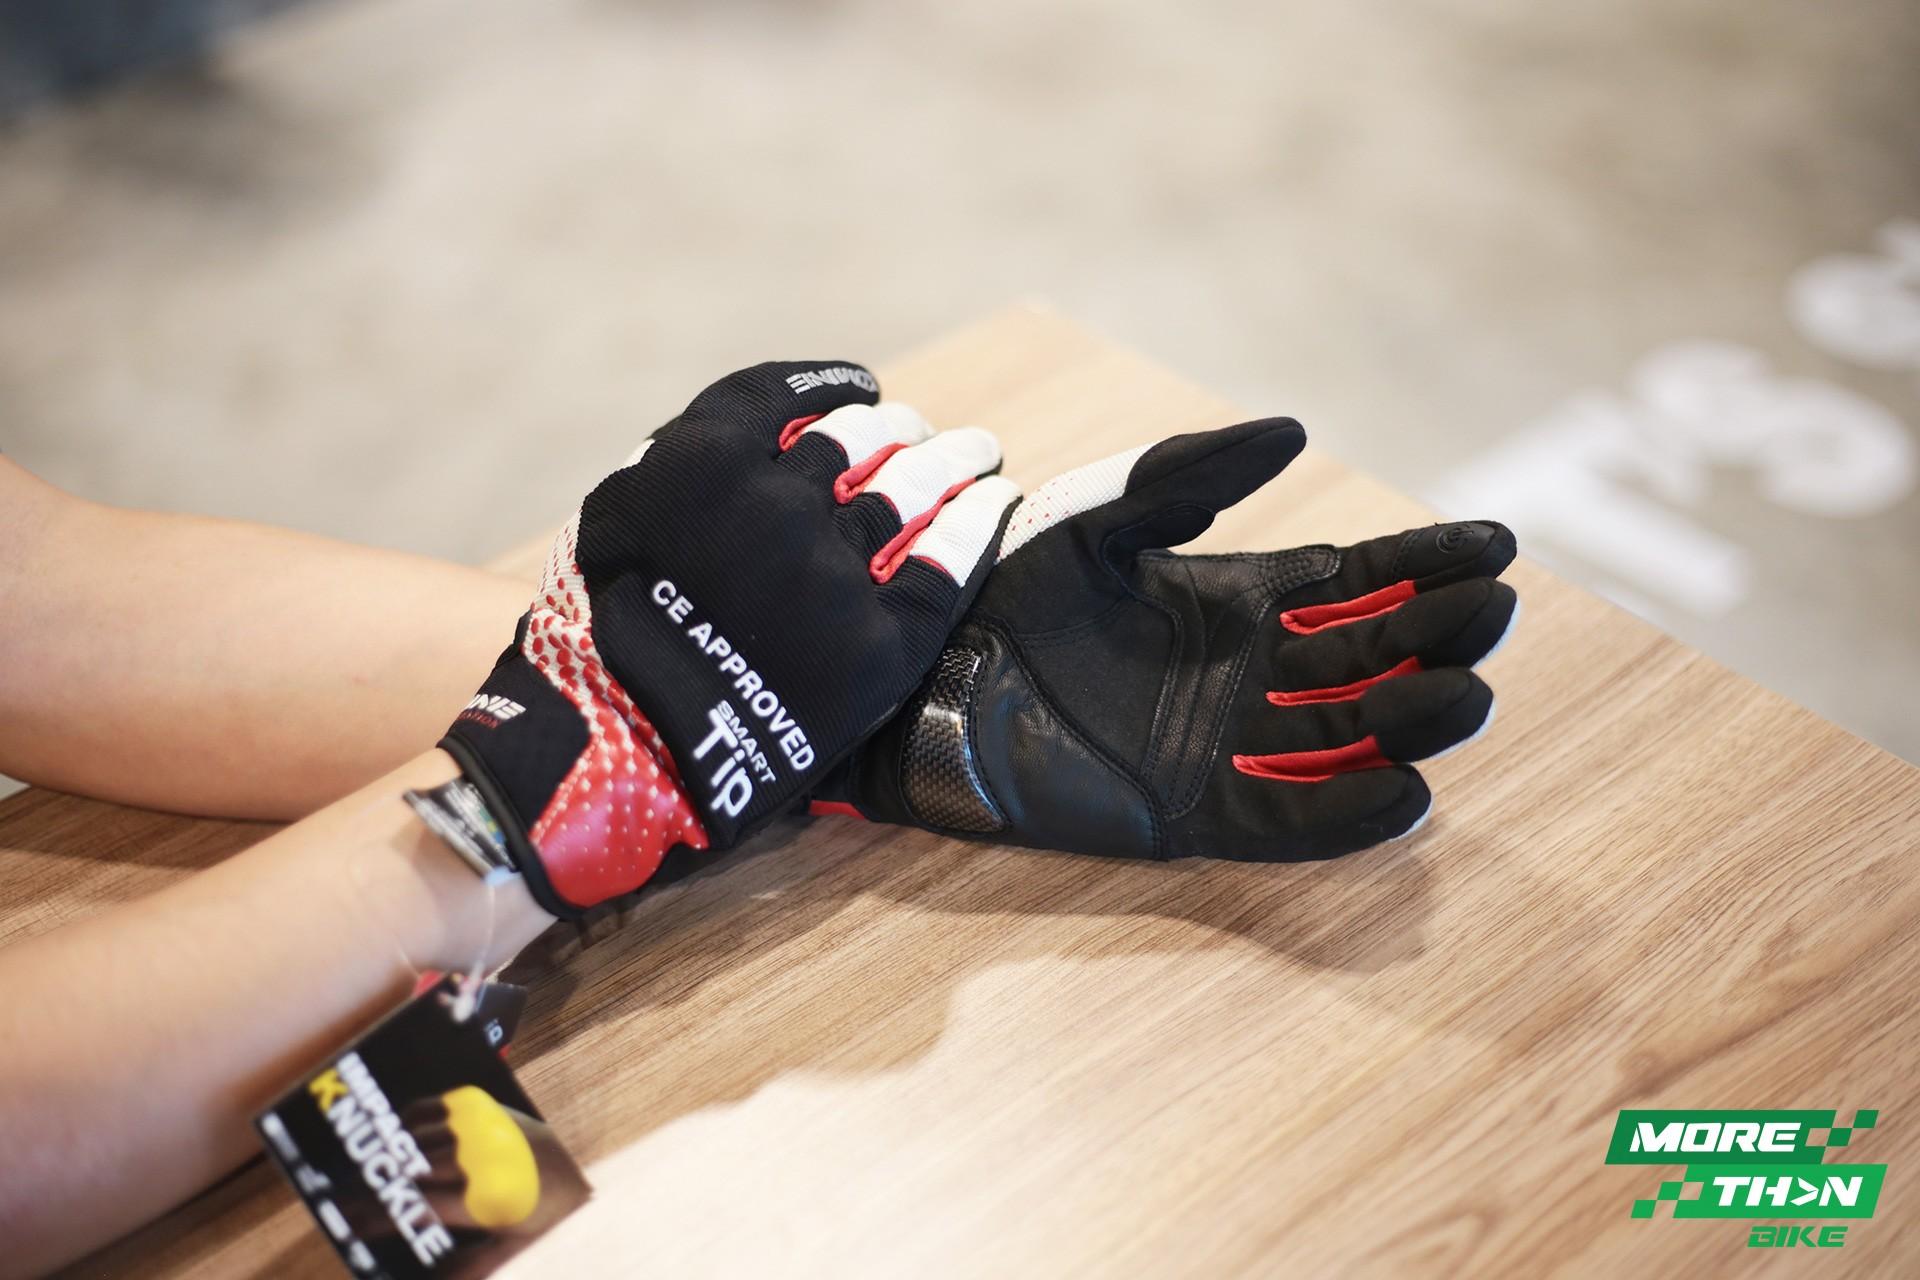 komine-gk-176-ce-protect-m-gloves-2